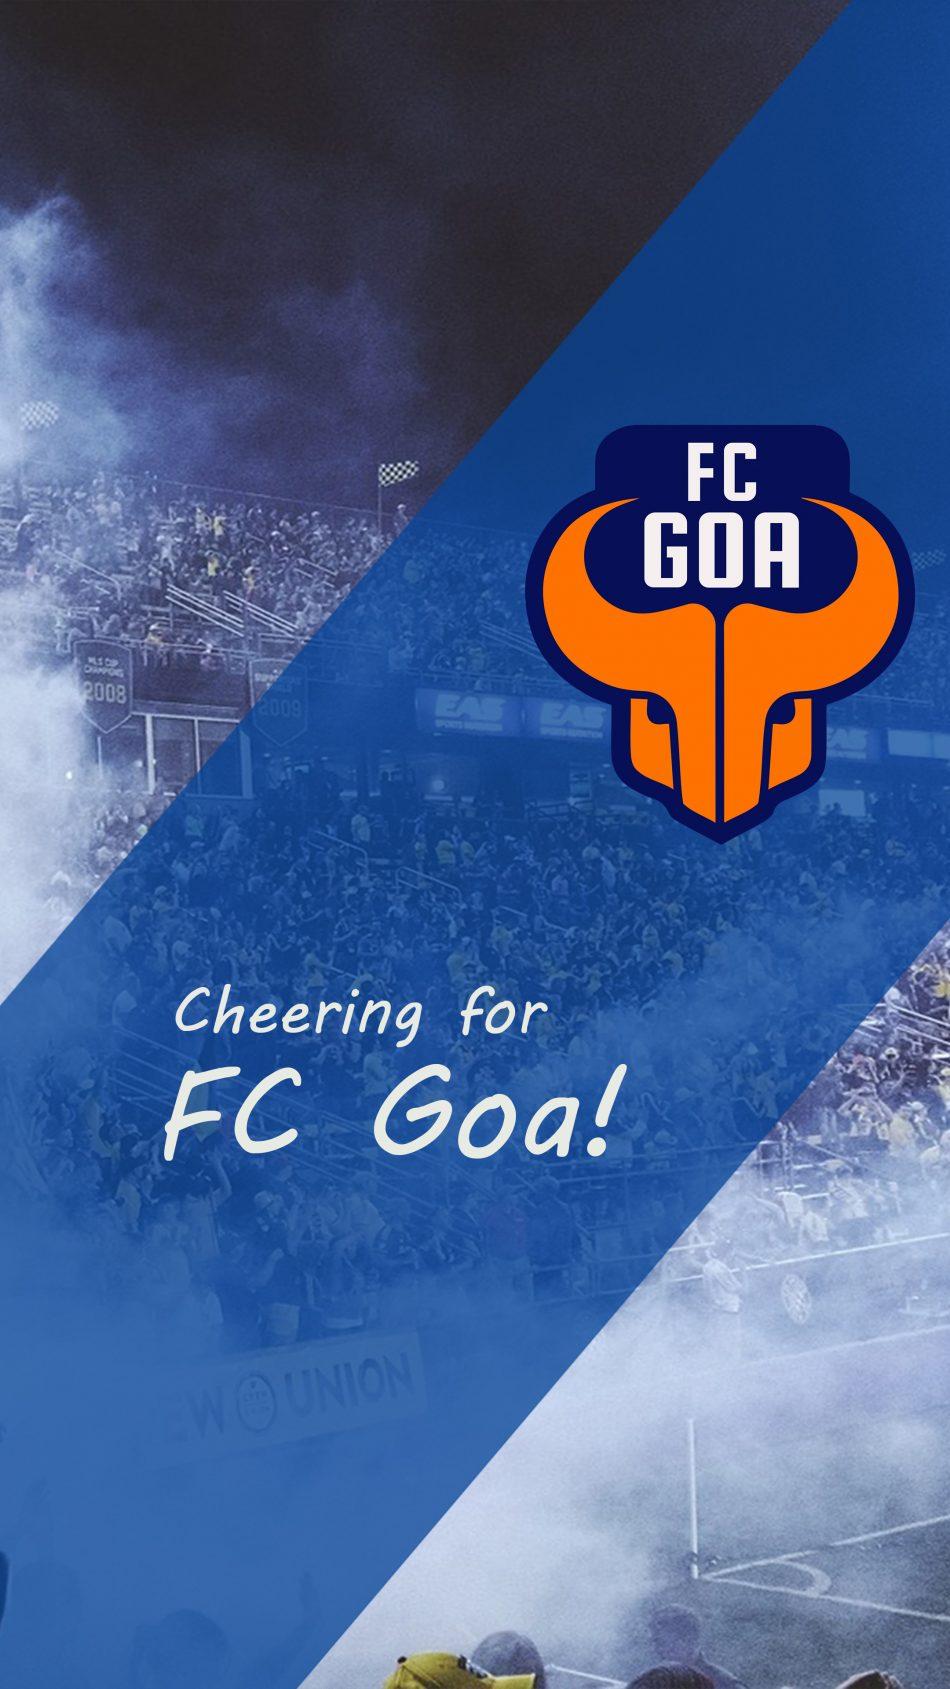 FC Goa ISL 2018 4K Ultra HD Mobile Wallpaper